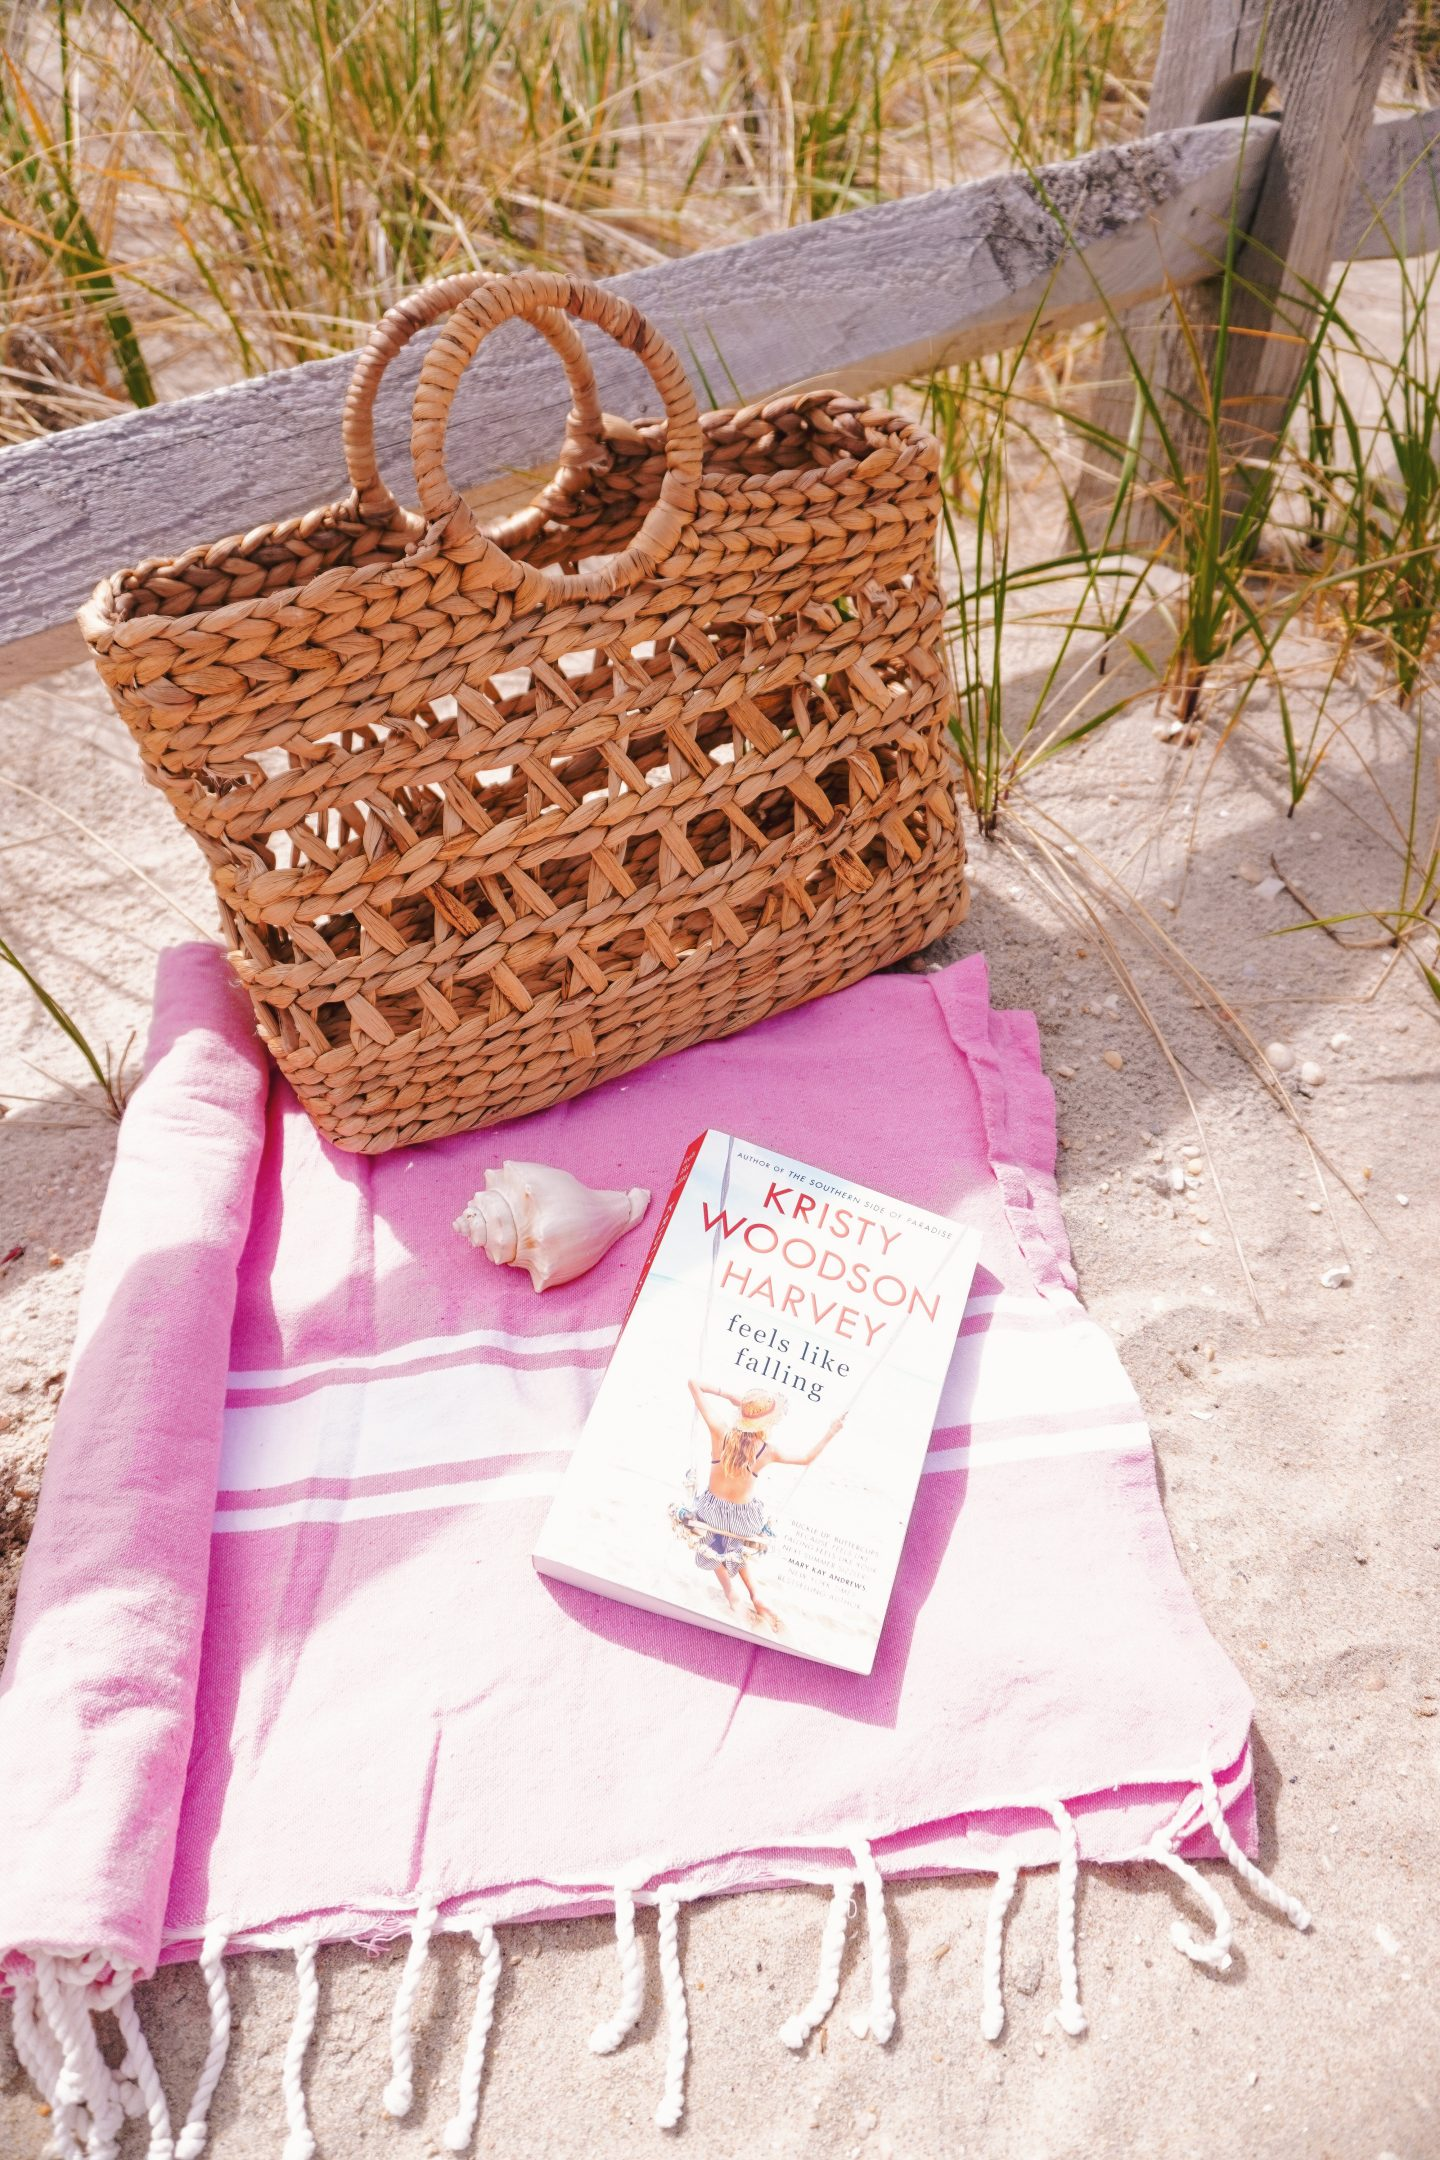 Kristy Woodson Harvey books